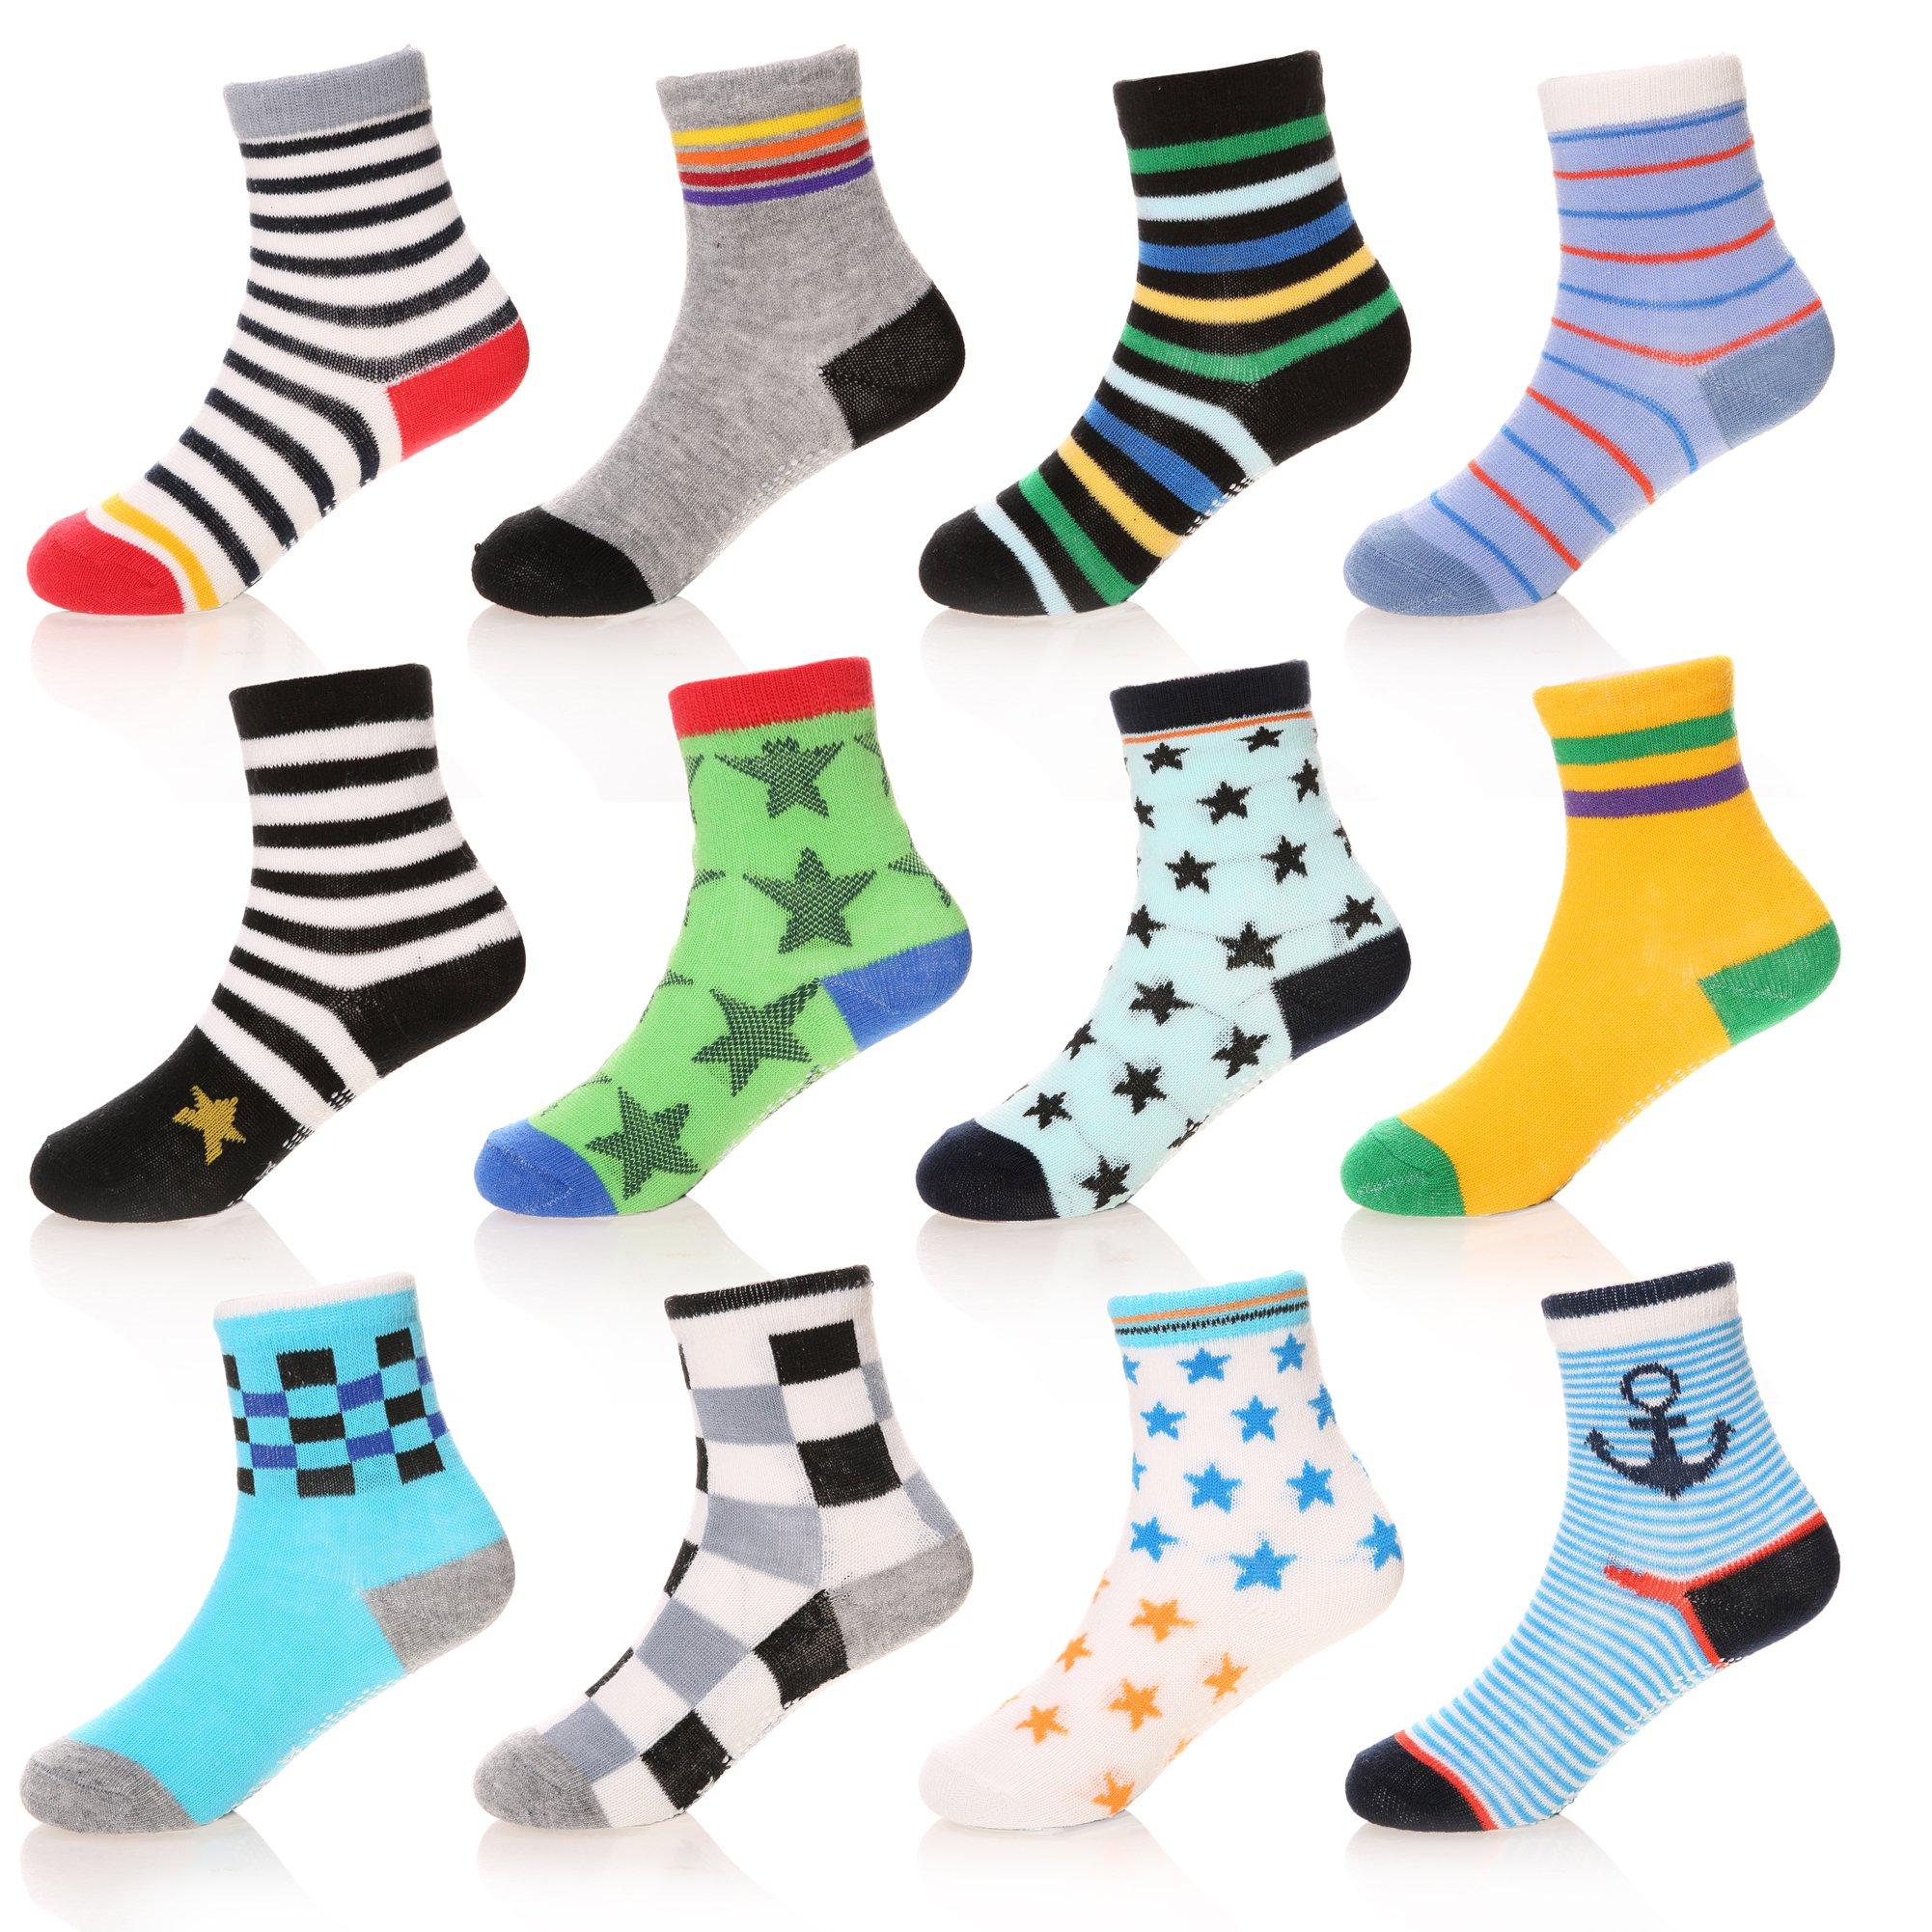 SDBING Baby's Cute 12-pair Thick Warm Cotton Socks (Anti-slip 1 to 3 Years Old) (12 Pair B04)